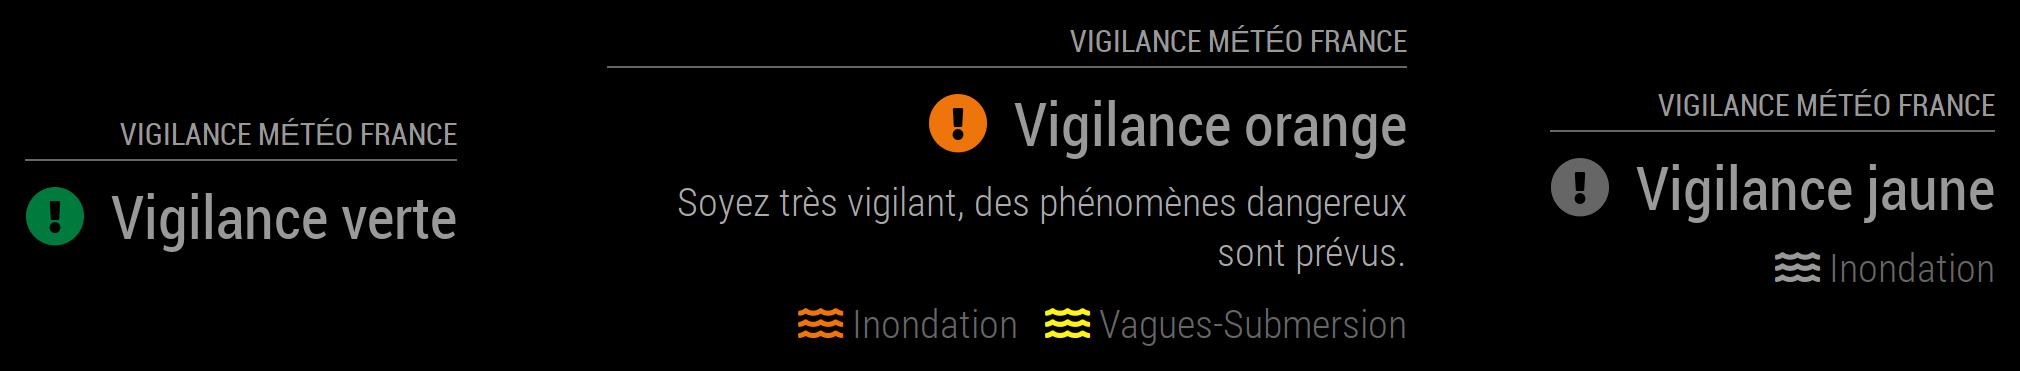 MMM-VigilanceMeteoFrance ScreenShots